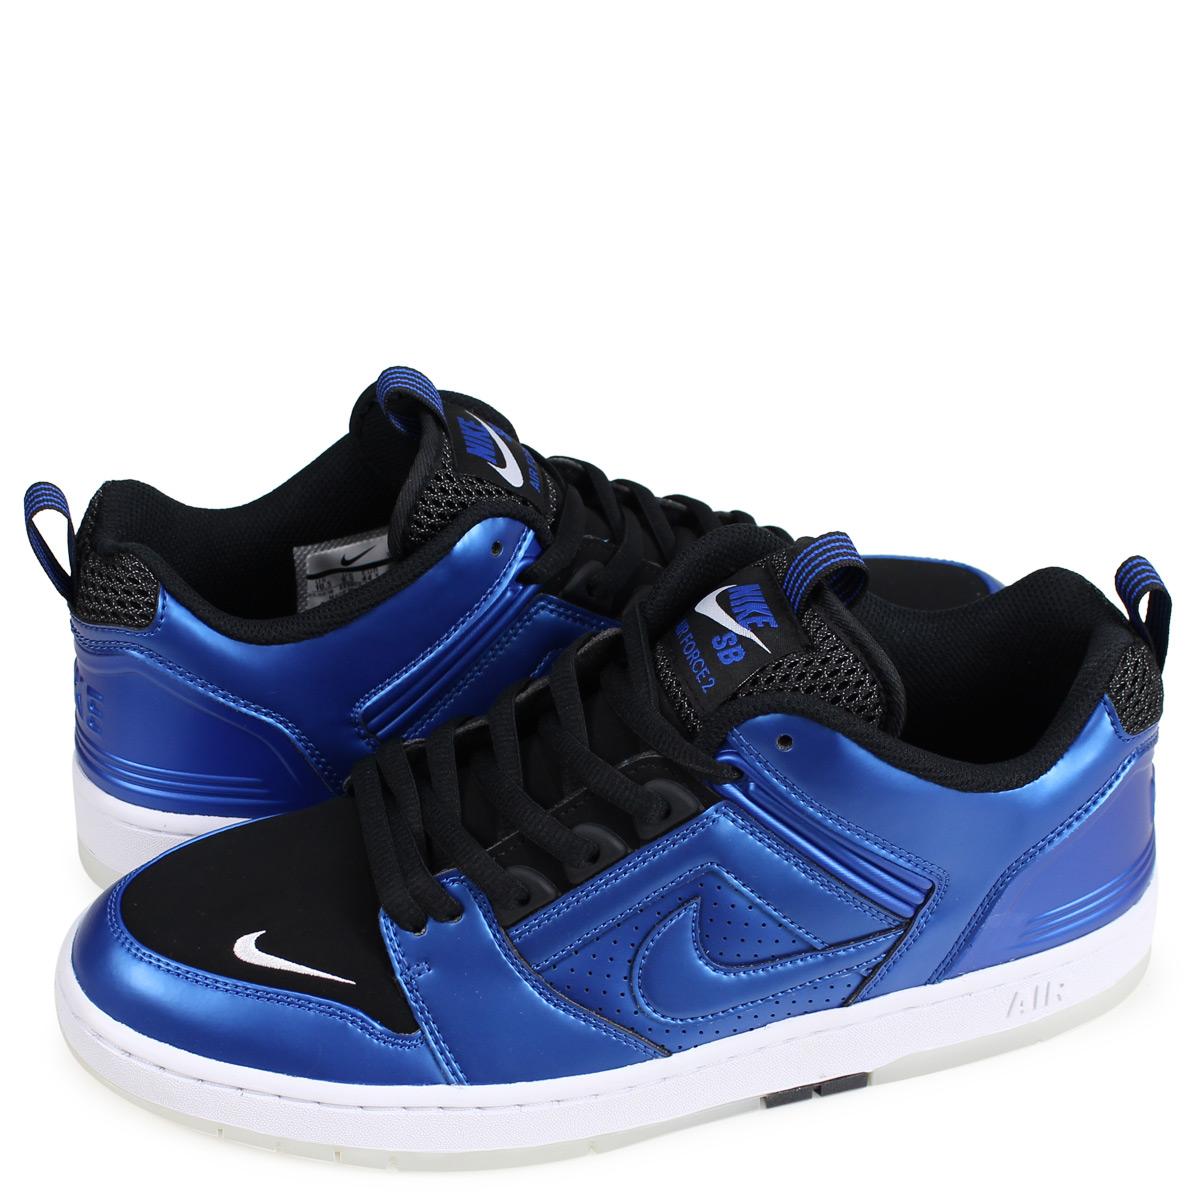 9c20edb3ba0 Nike NIKE SB air force 2 sneakers men AIR FORCE 2 LOW FOAMPOSITE 1 blue  AV3800-440  1812